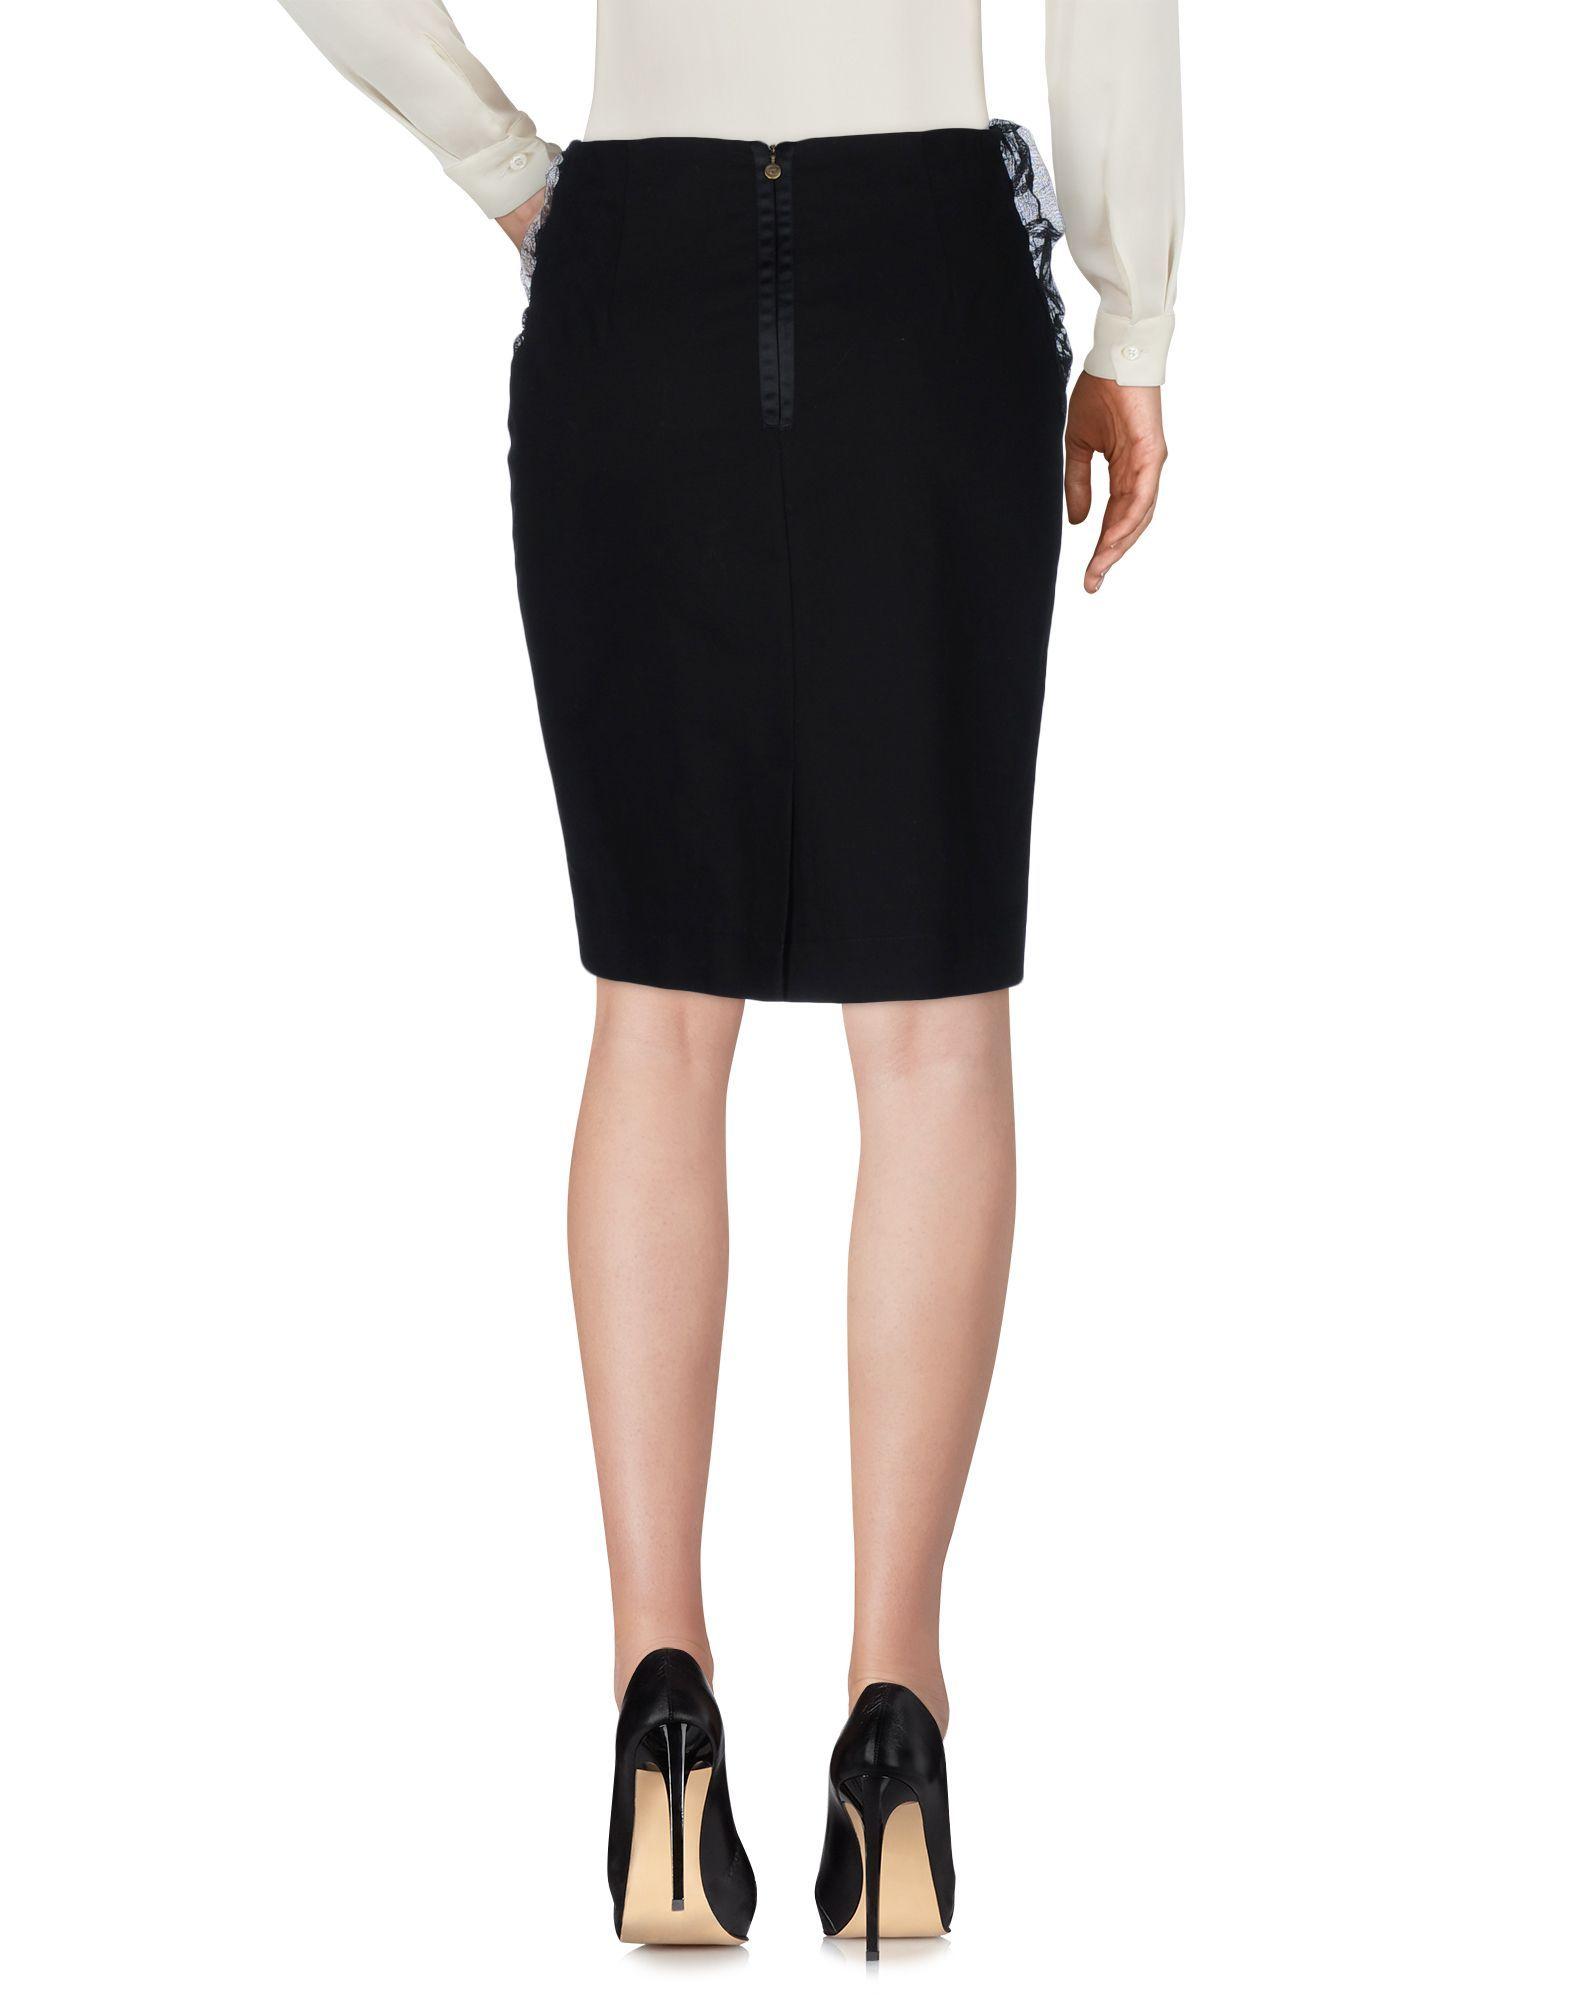 Just Cavalli Black Cotton Knee Length Skirt